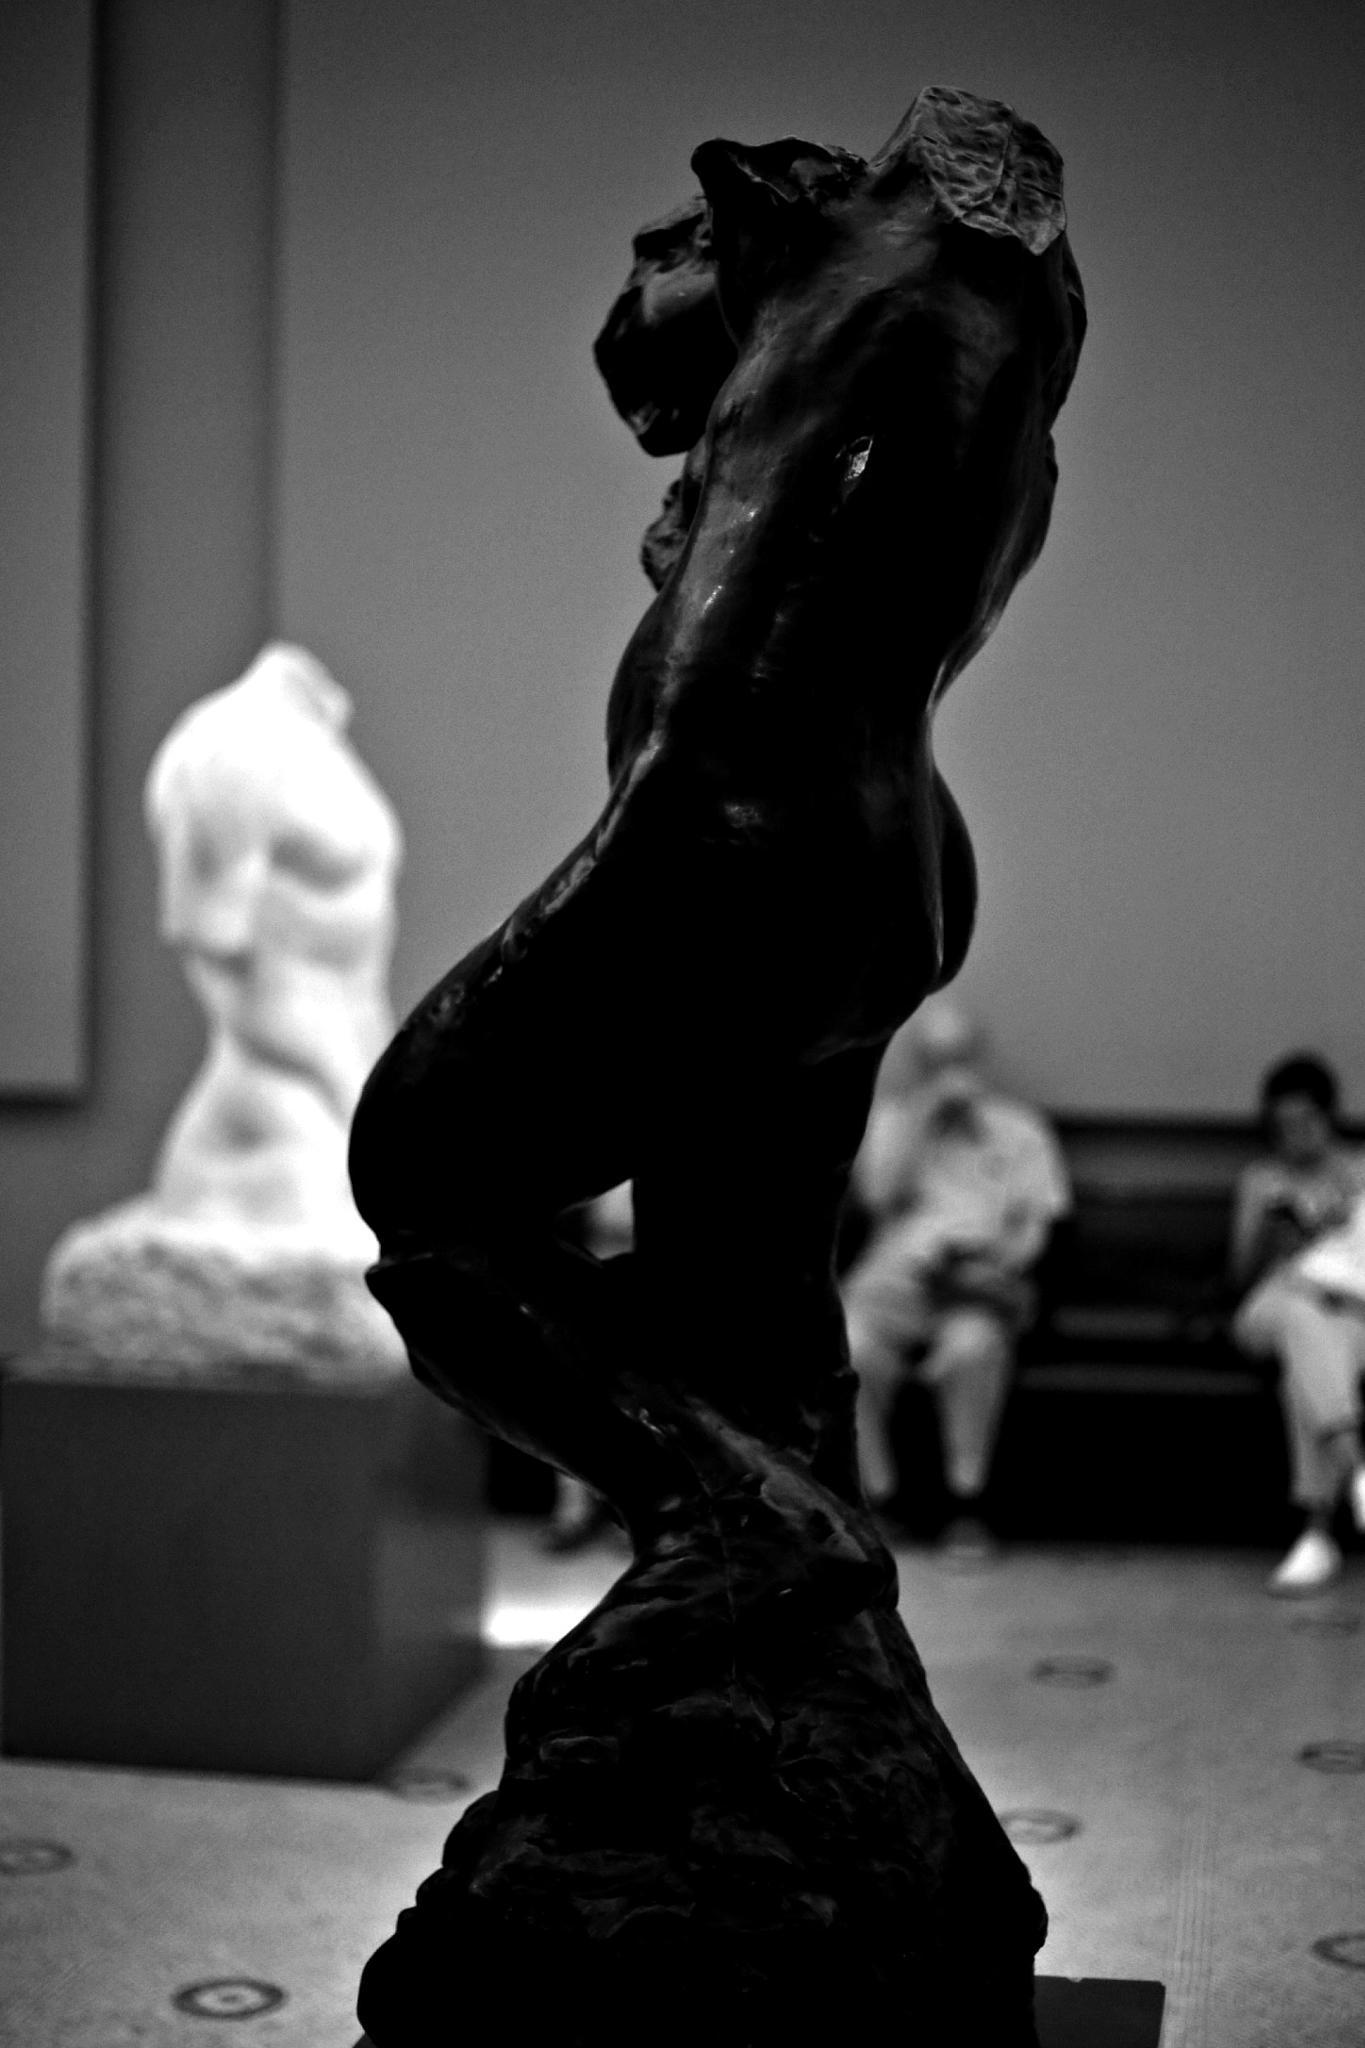 A work of Rodin by Cora